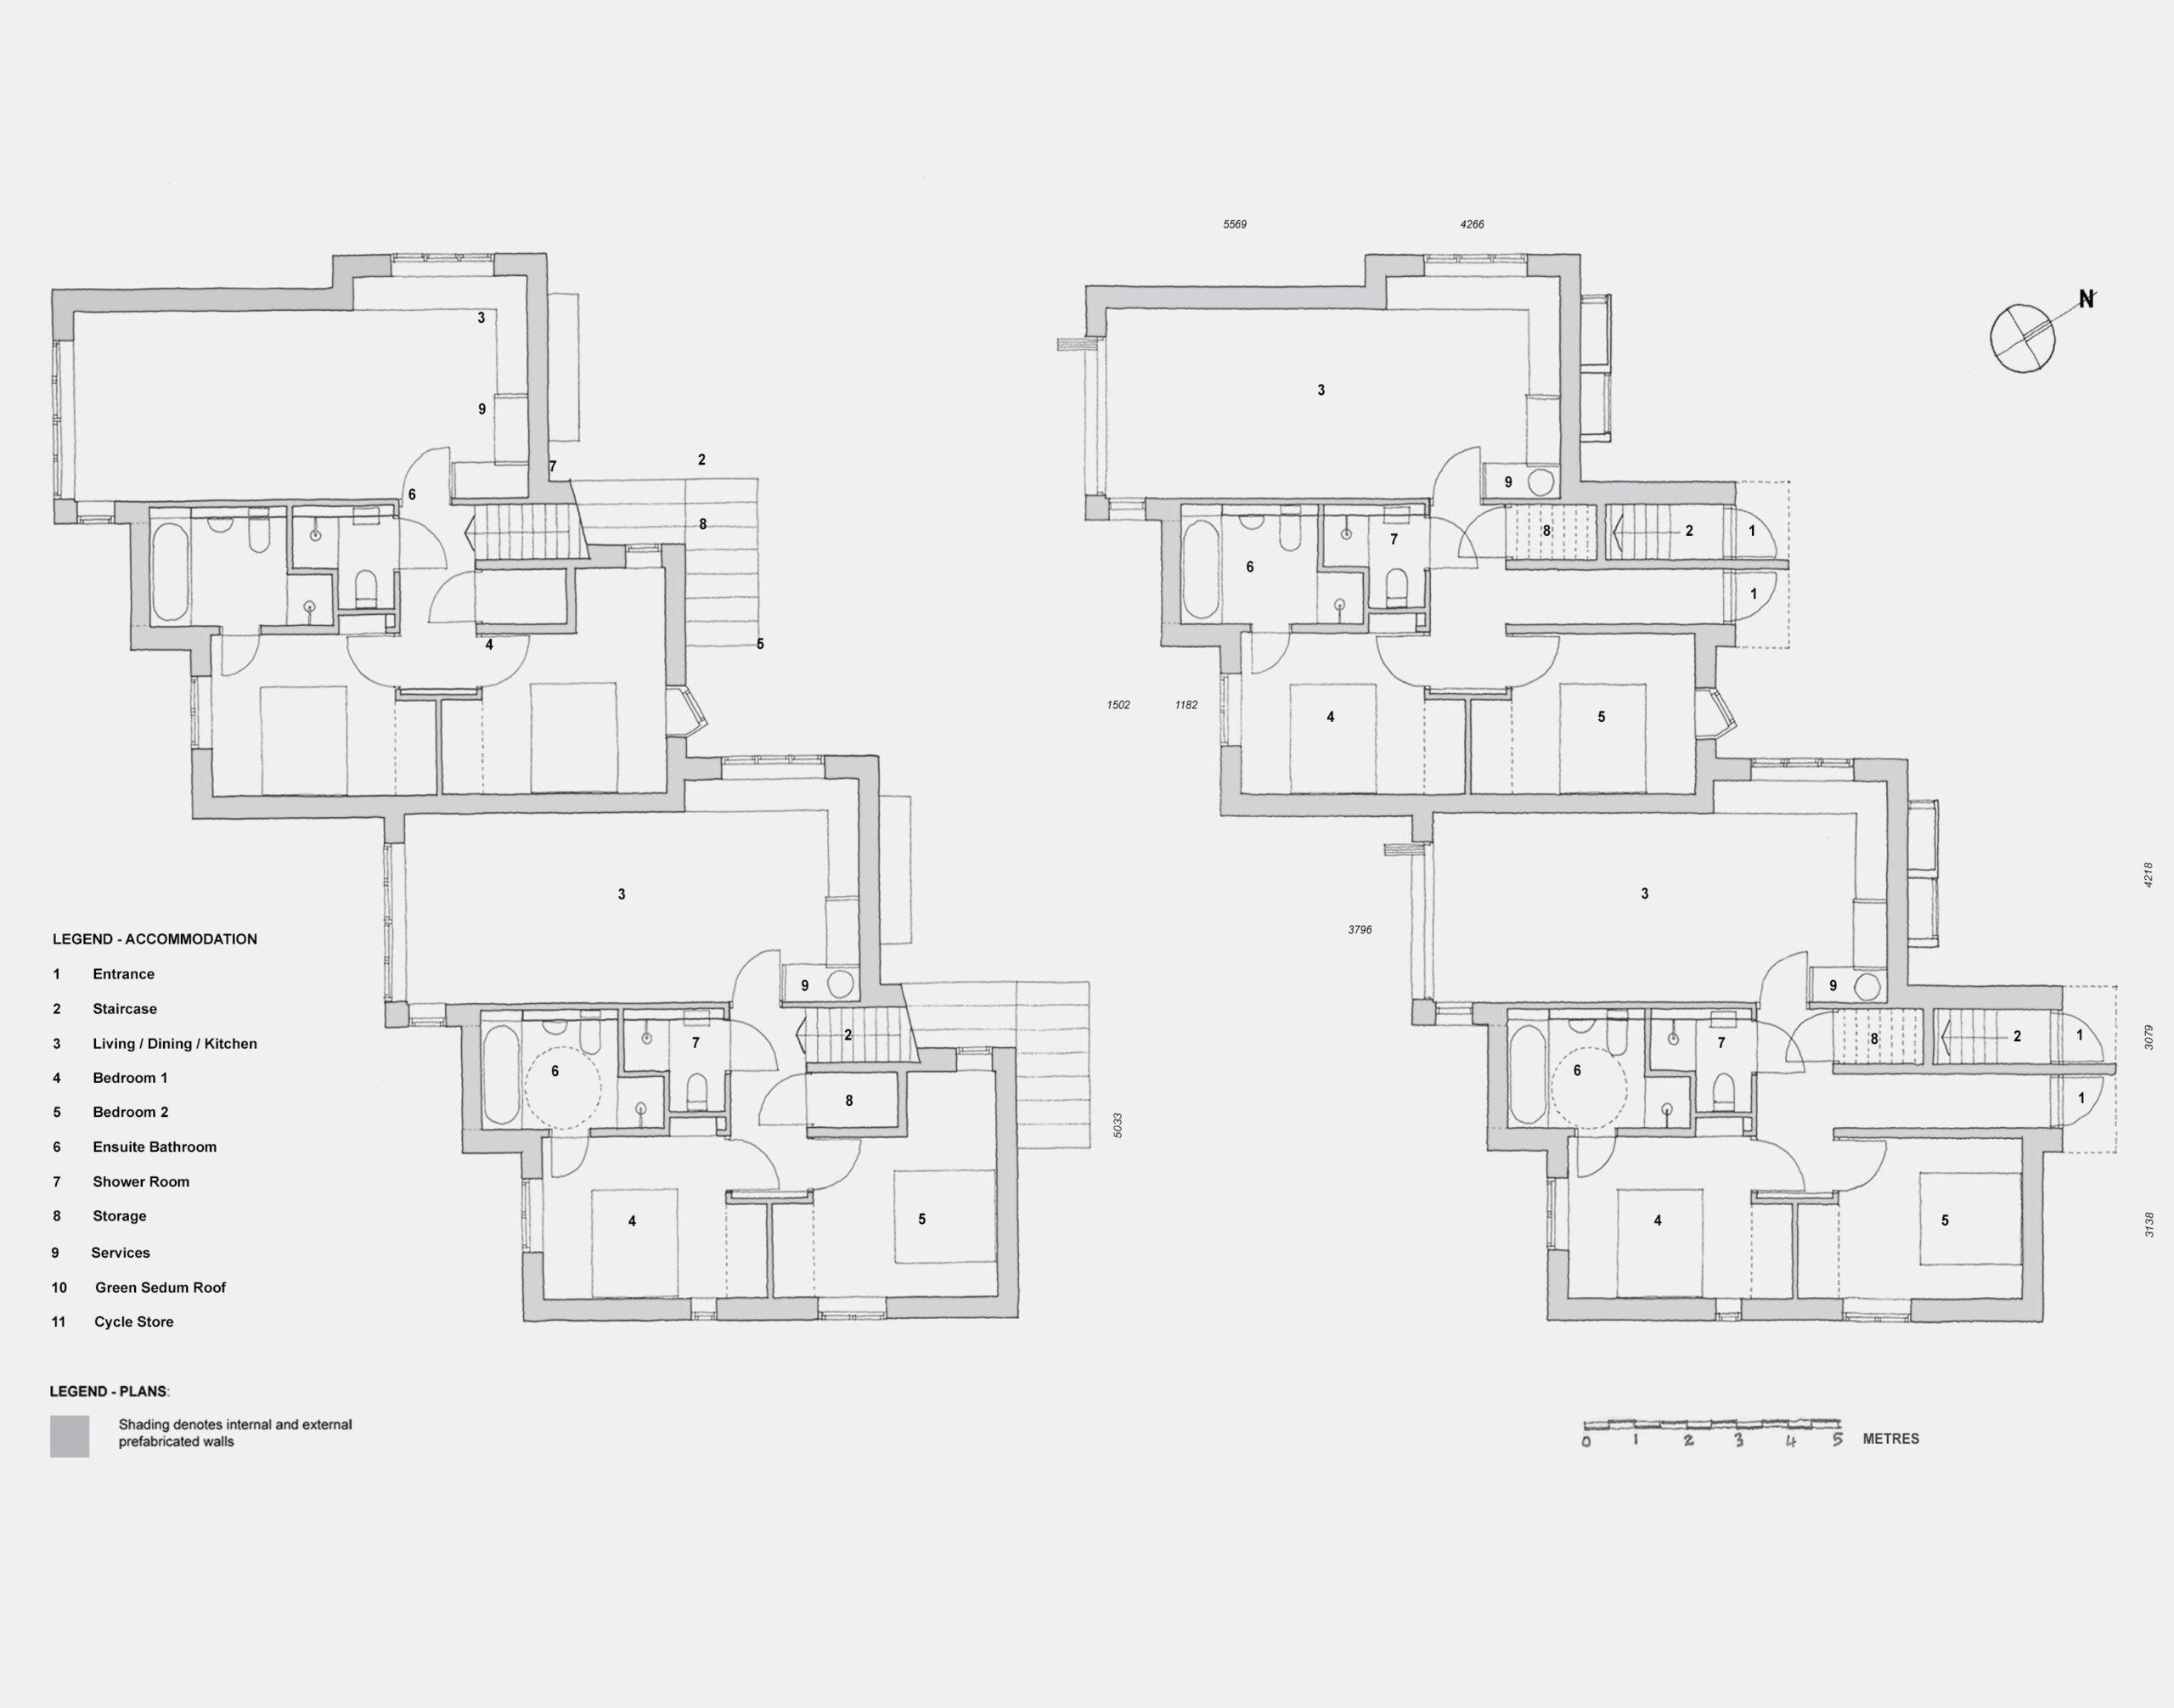 Low energy M - floor plans